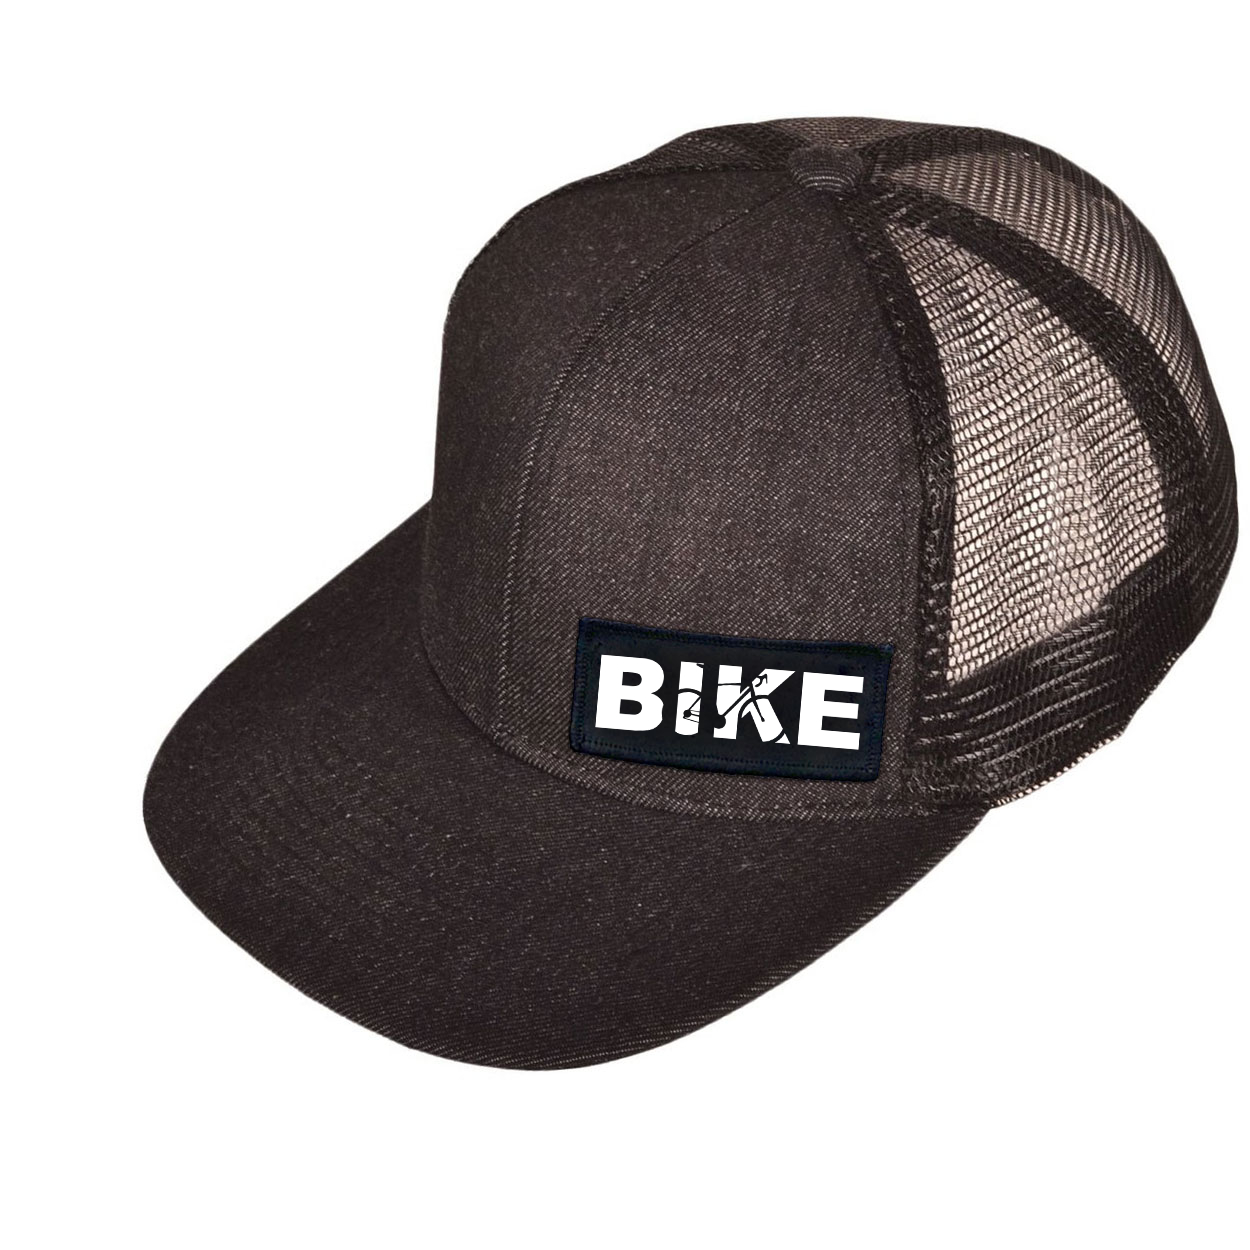 Bike Cycling Logo Night Out Woven Patch Snapback Flat Brim Hat Black Denim (White Logo)